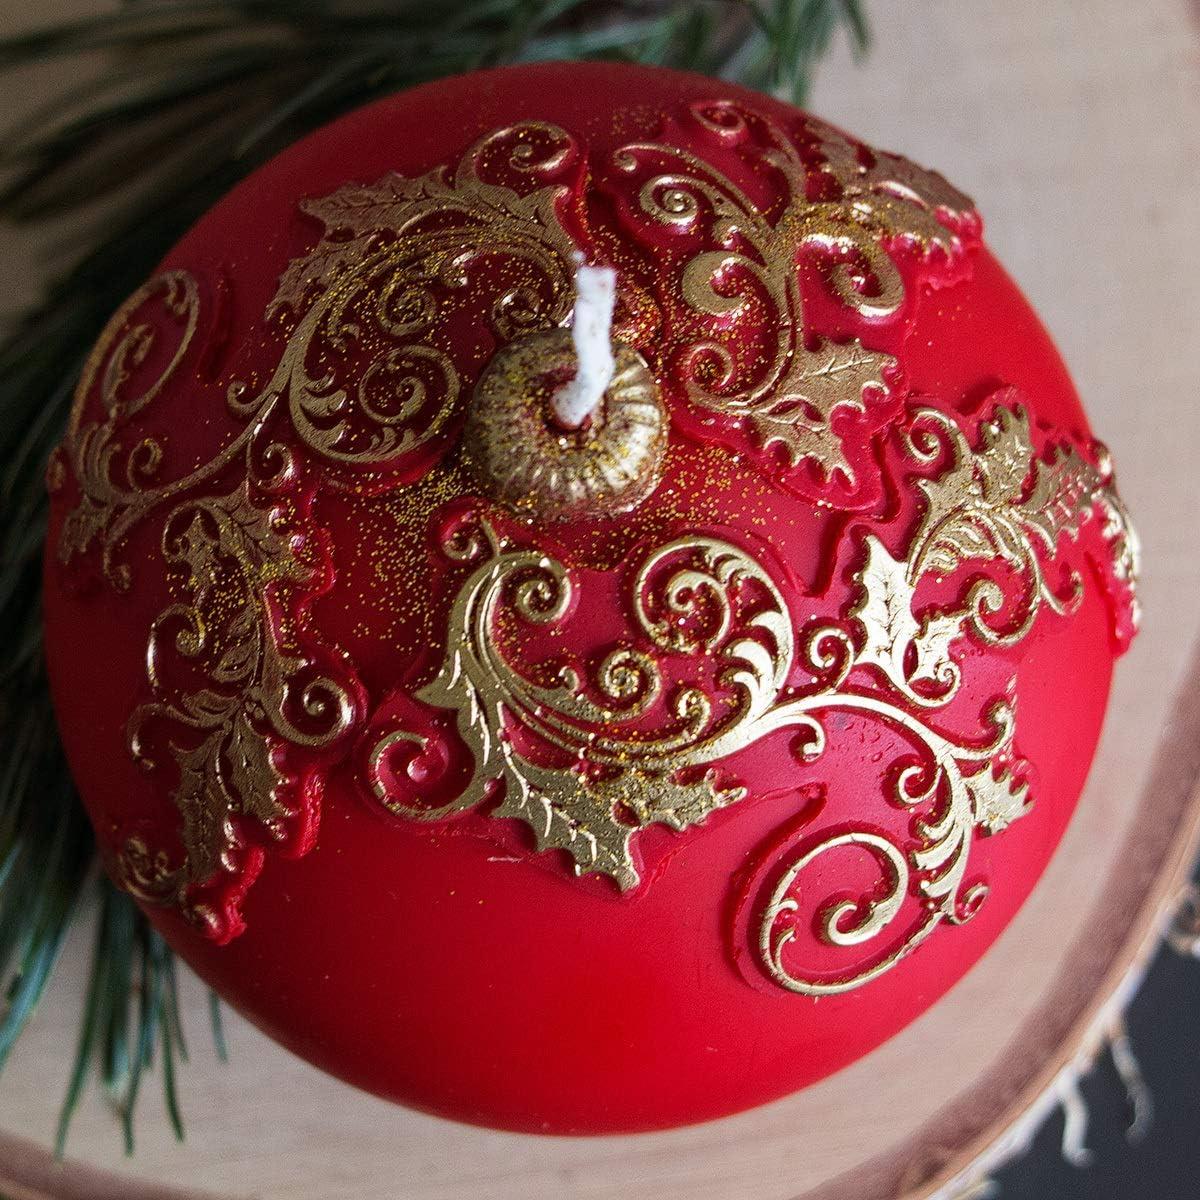 holzalbum Festtagskerze Wachs 3D Motiv Weihnachtskerze Kugelkerze /Ø 10 cm Adventskerze